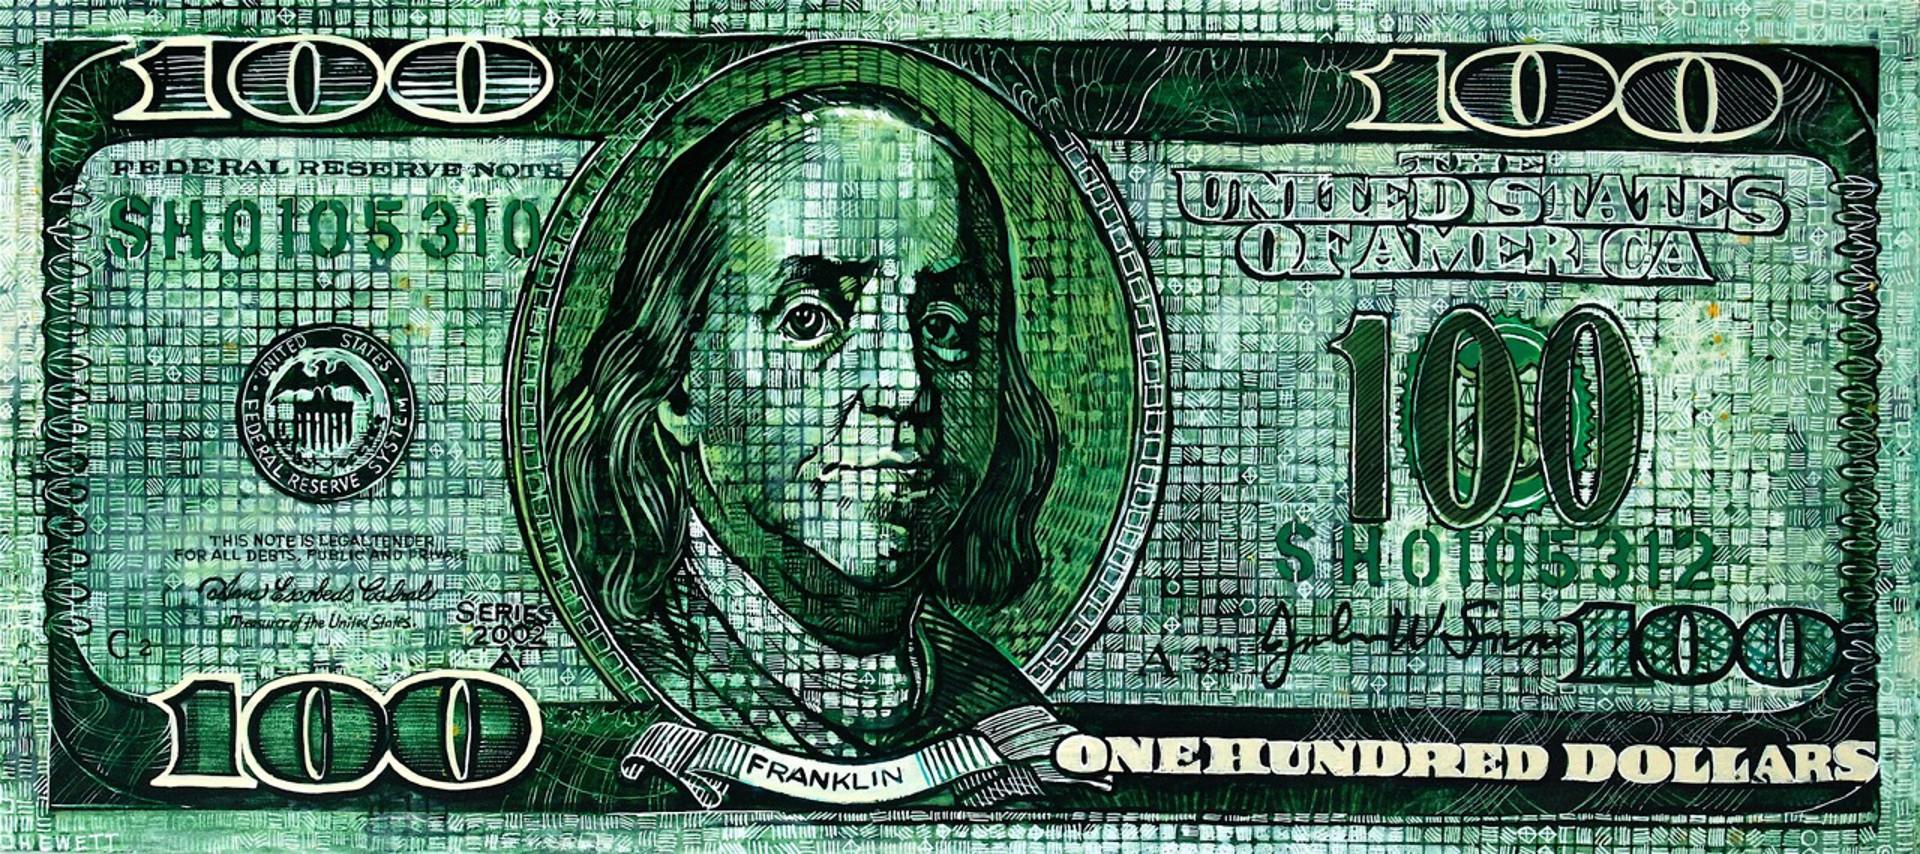 100 Dollar Bill by Scott Hewett